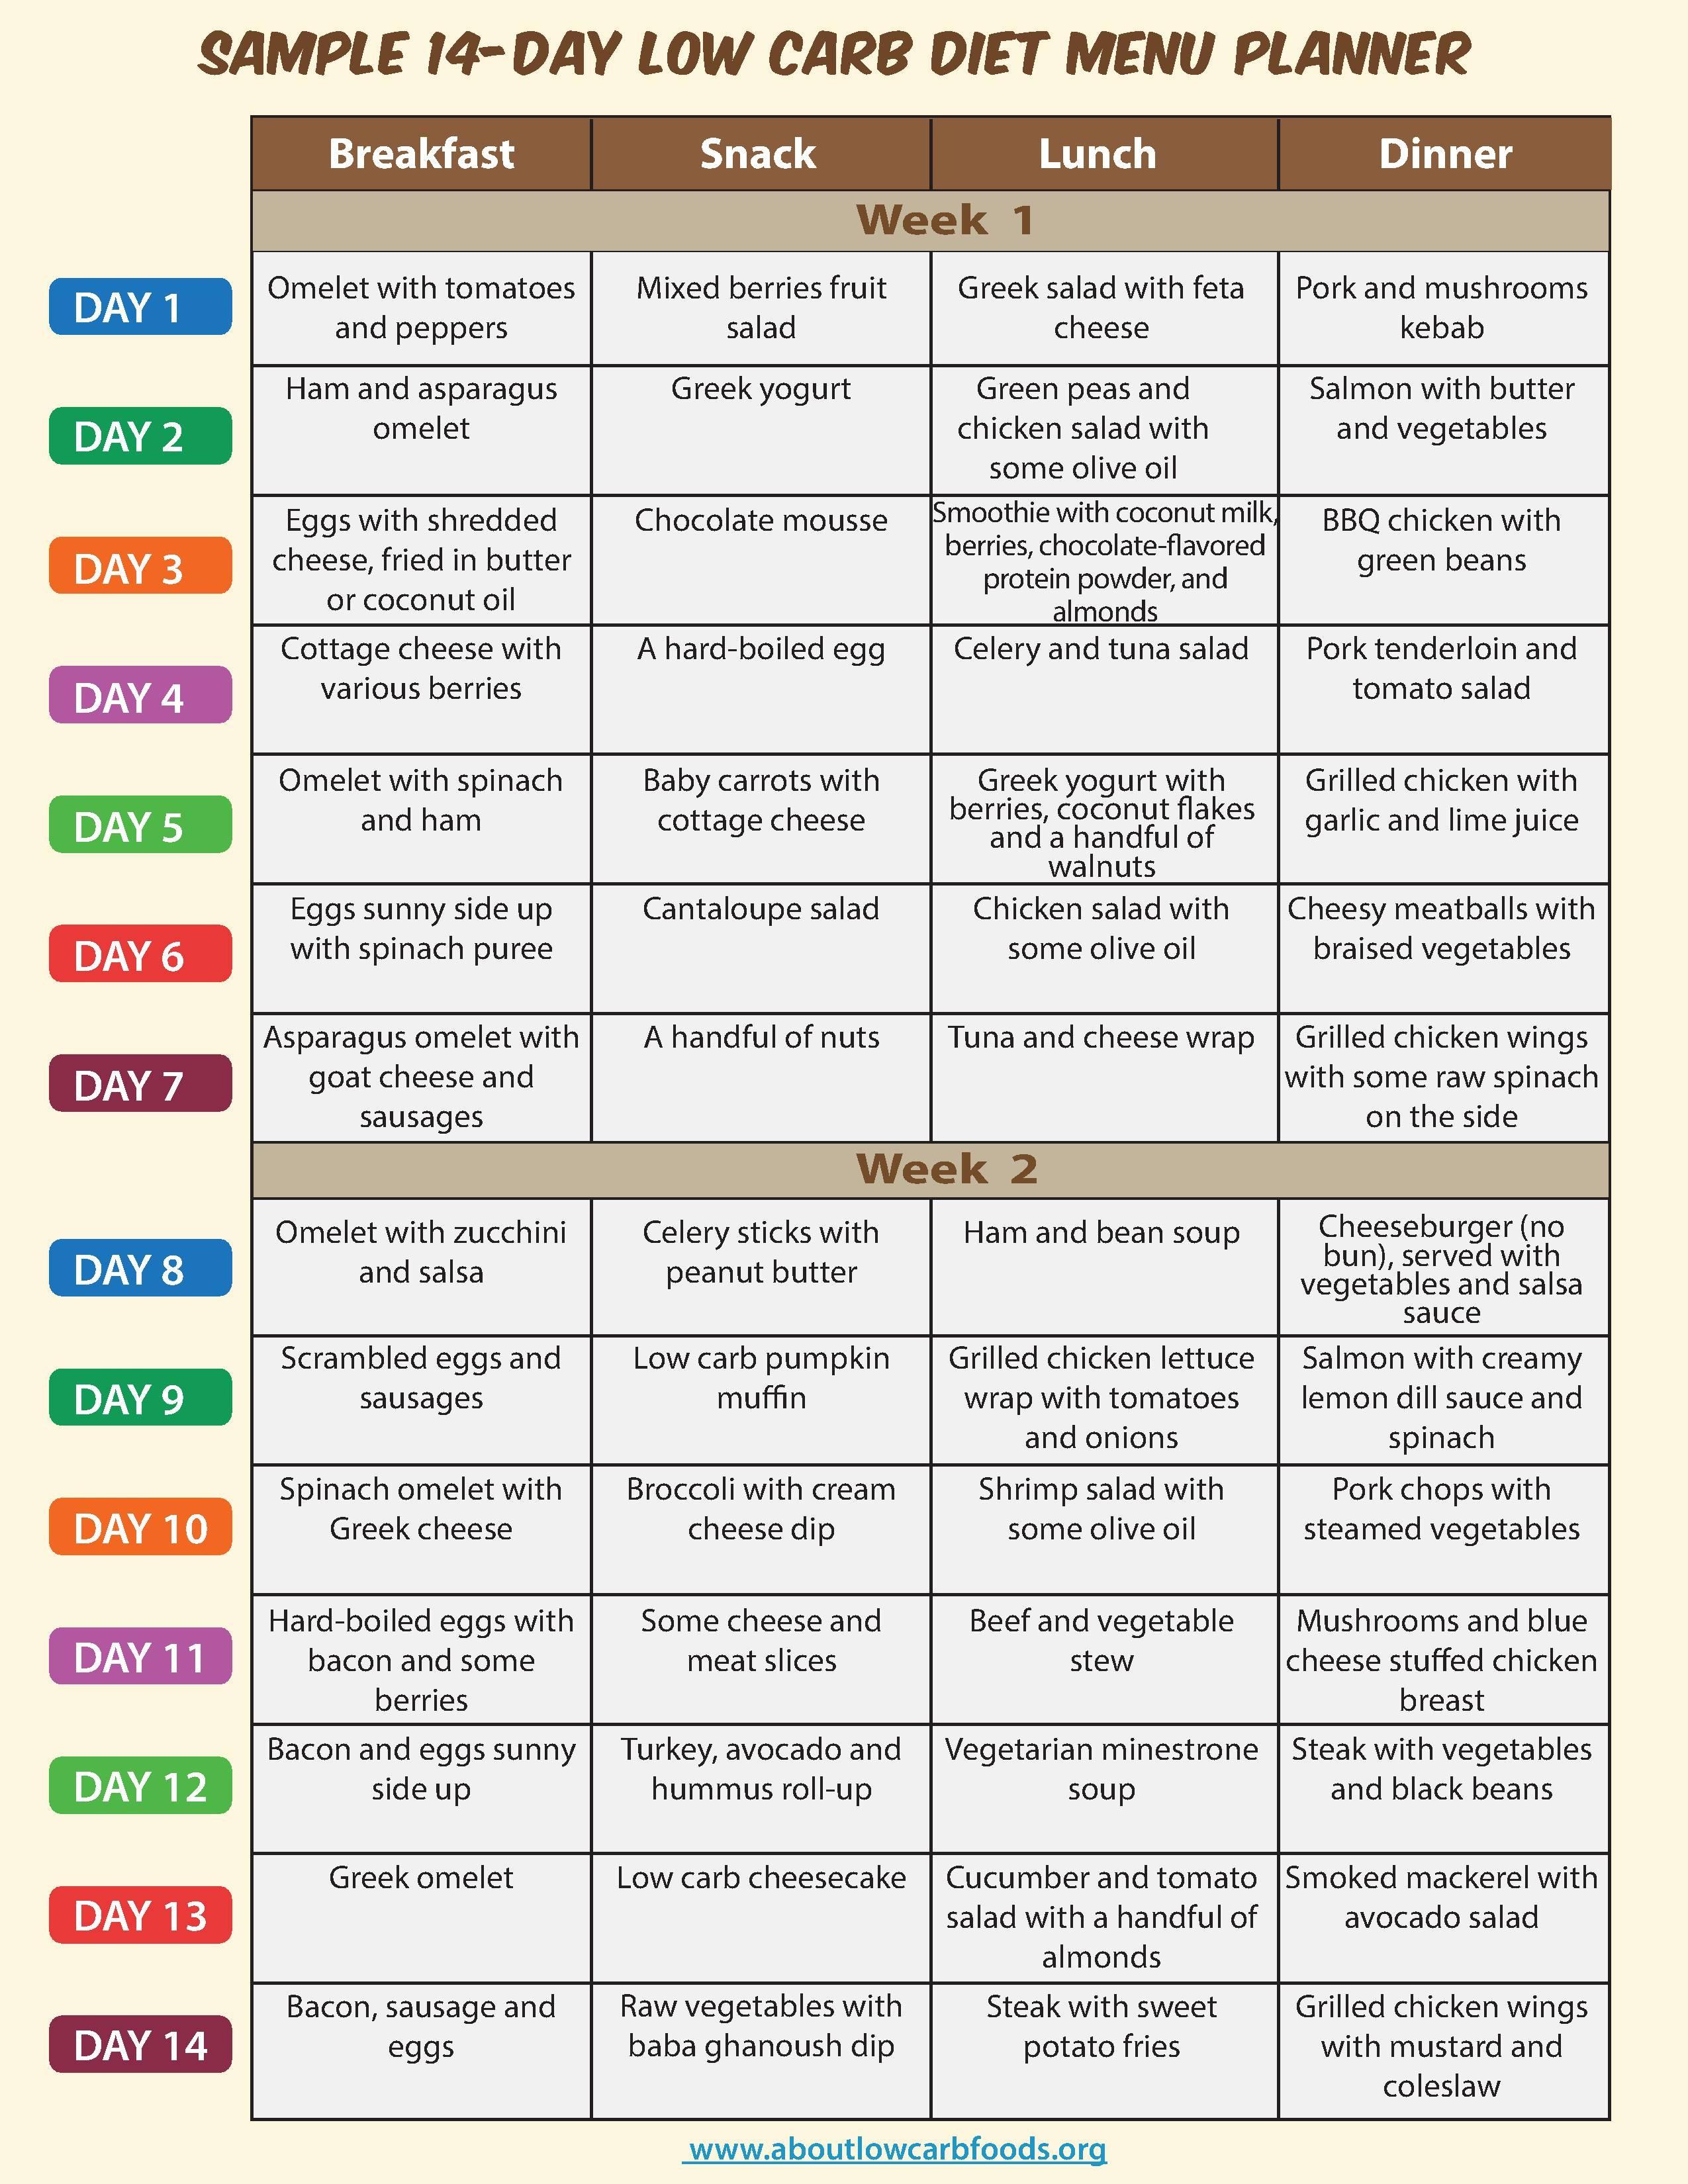 Sample Low Carb Diet Menu - About Low Carb Foods - Free Printable Low Carb Diet Plans